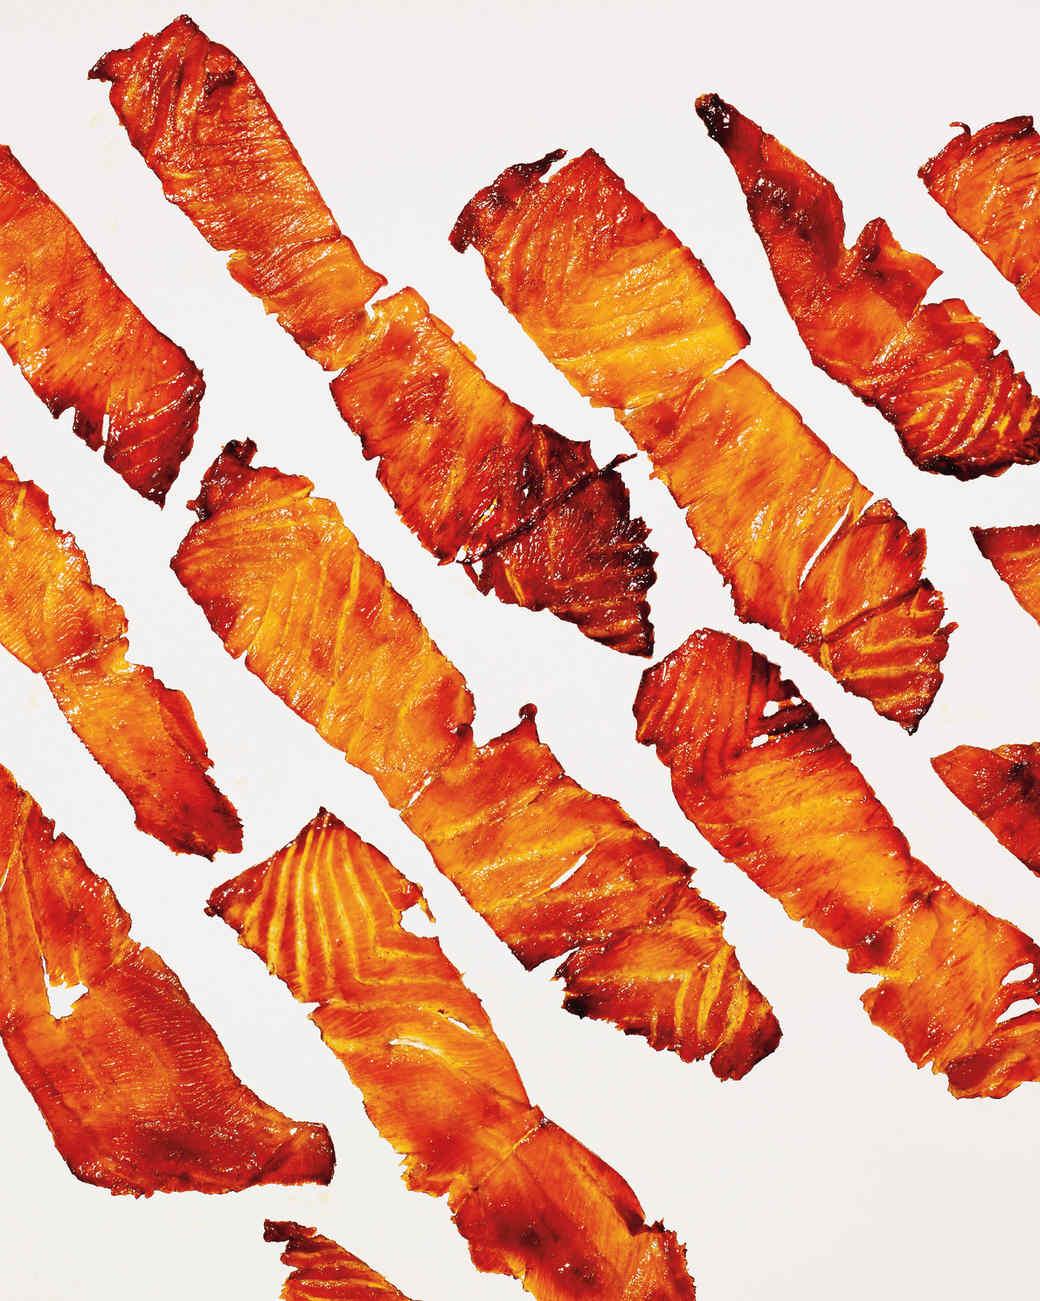 salmon-bacon-appetizer-320-d112293.jpg